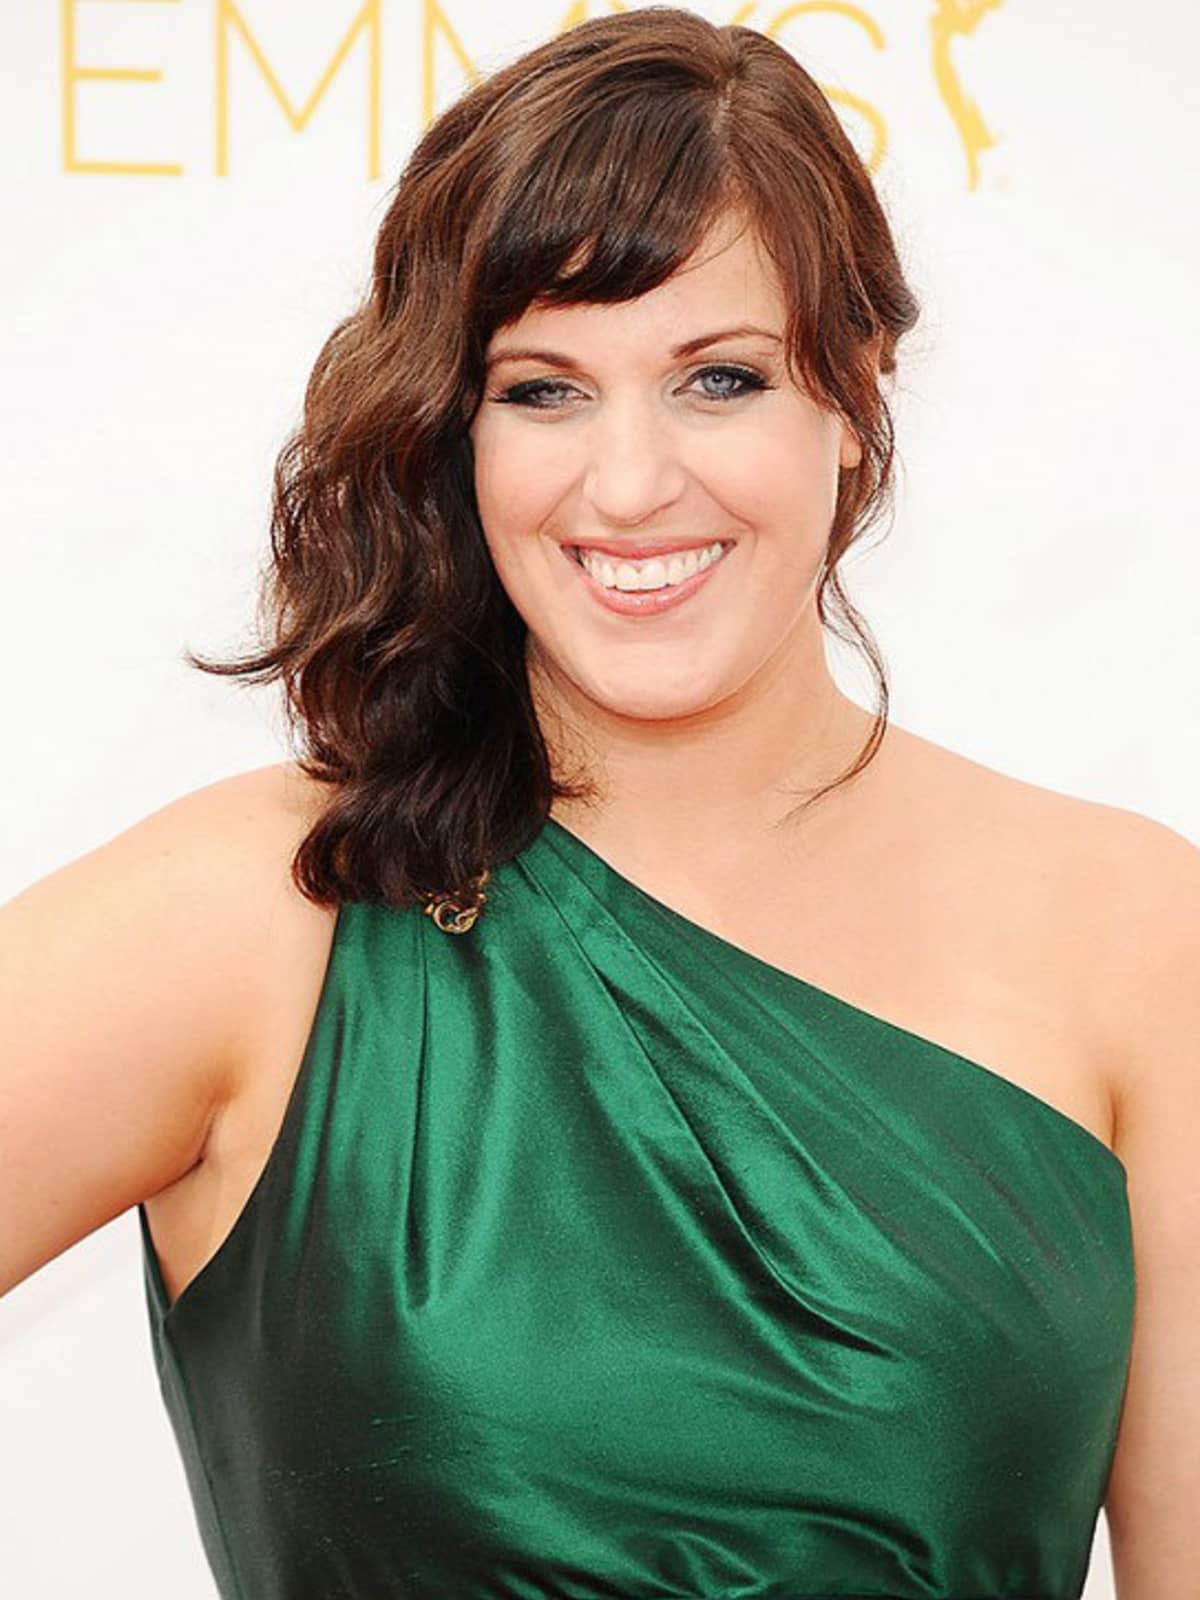 Allison Tolman at Emmys